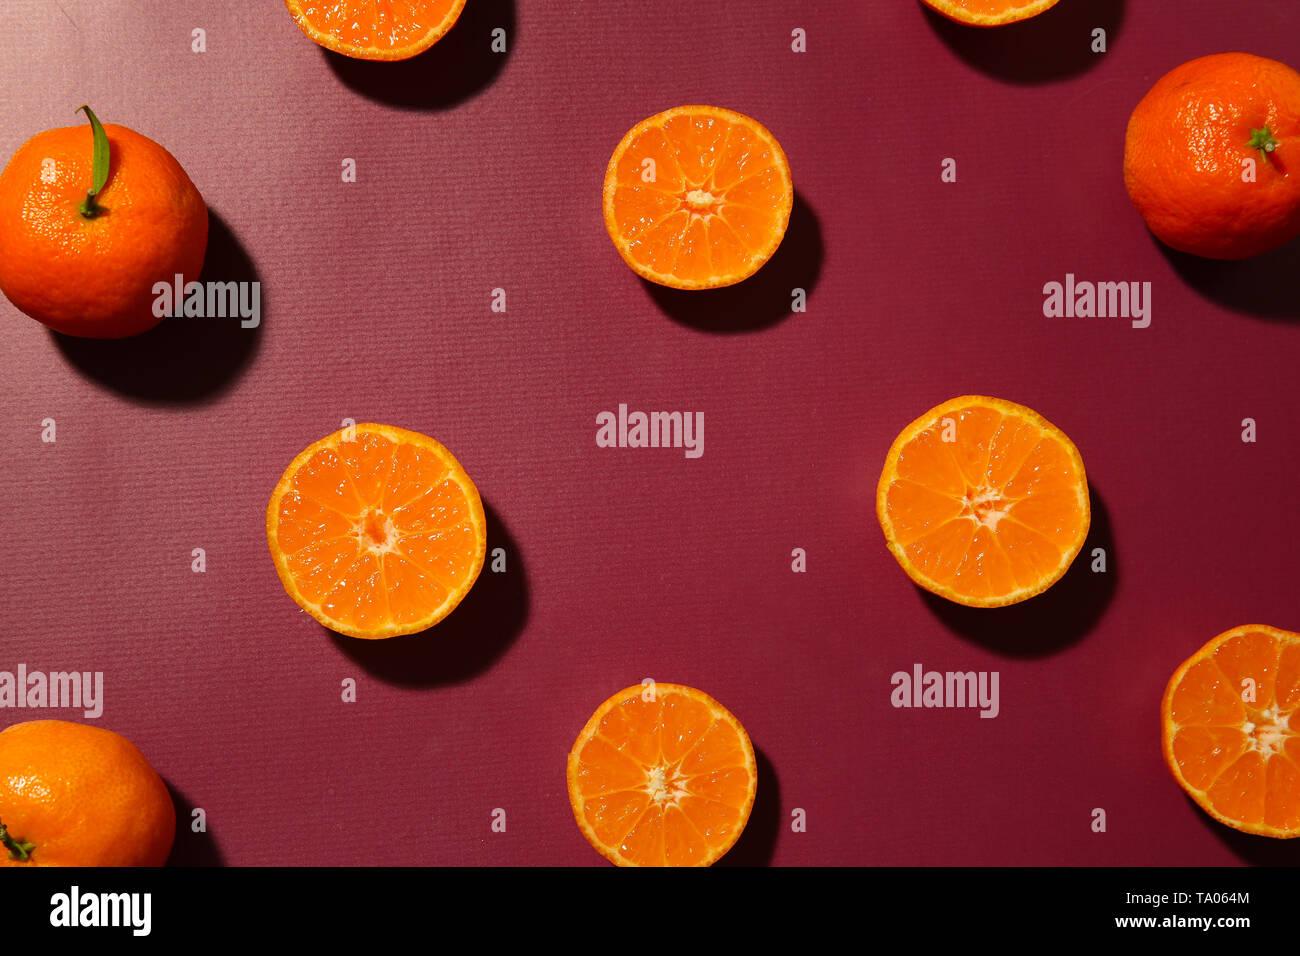 Plenty of fresh tangerines on color background - Stock Image